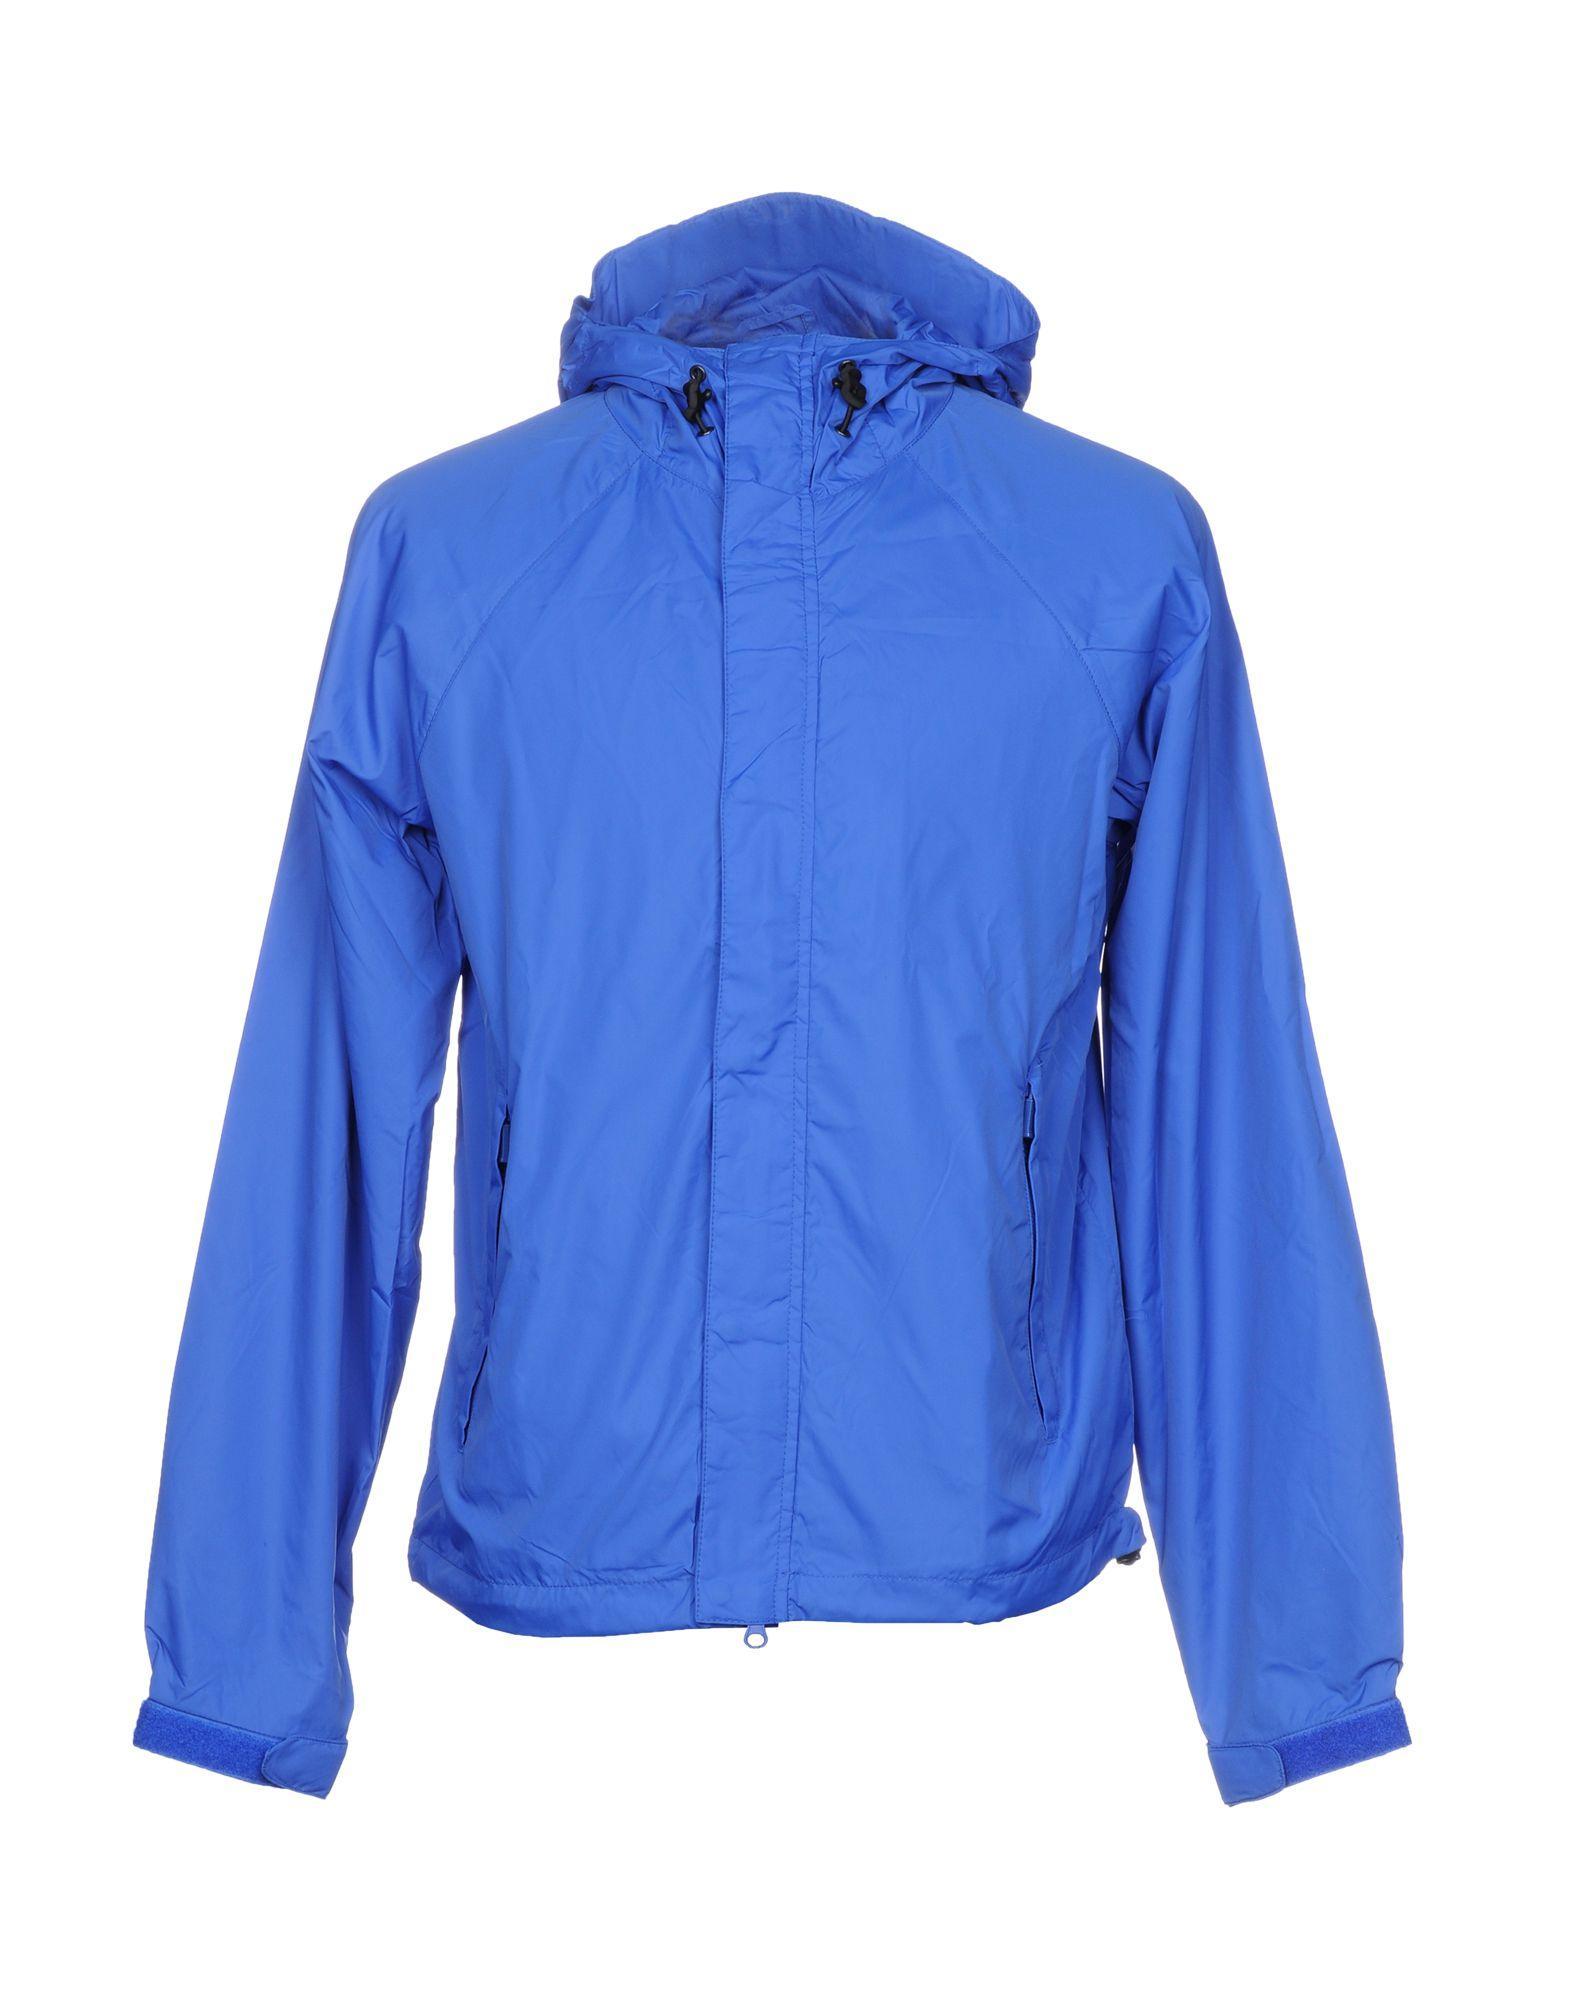 Aspesi Jackets In Bright Blue